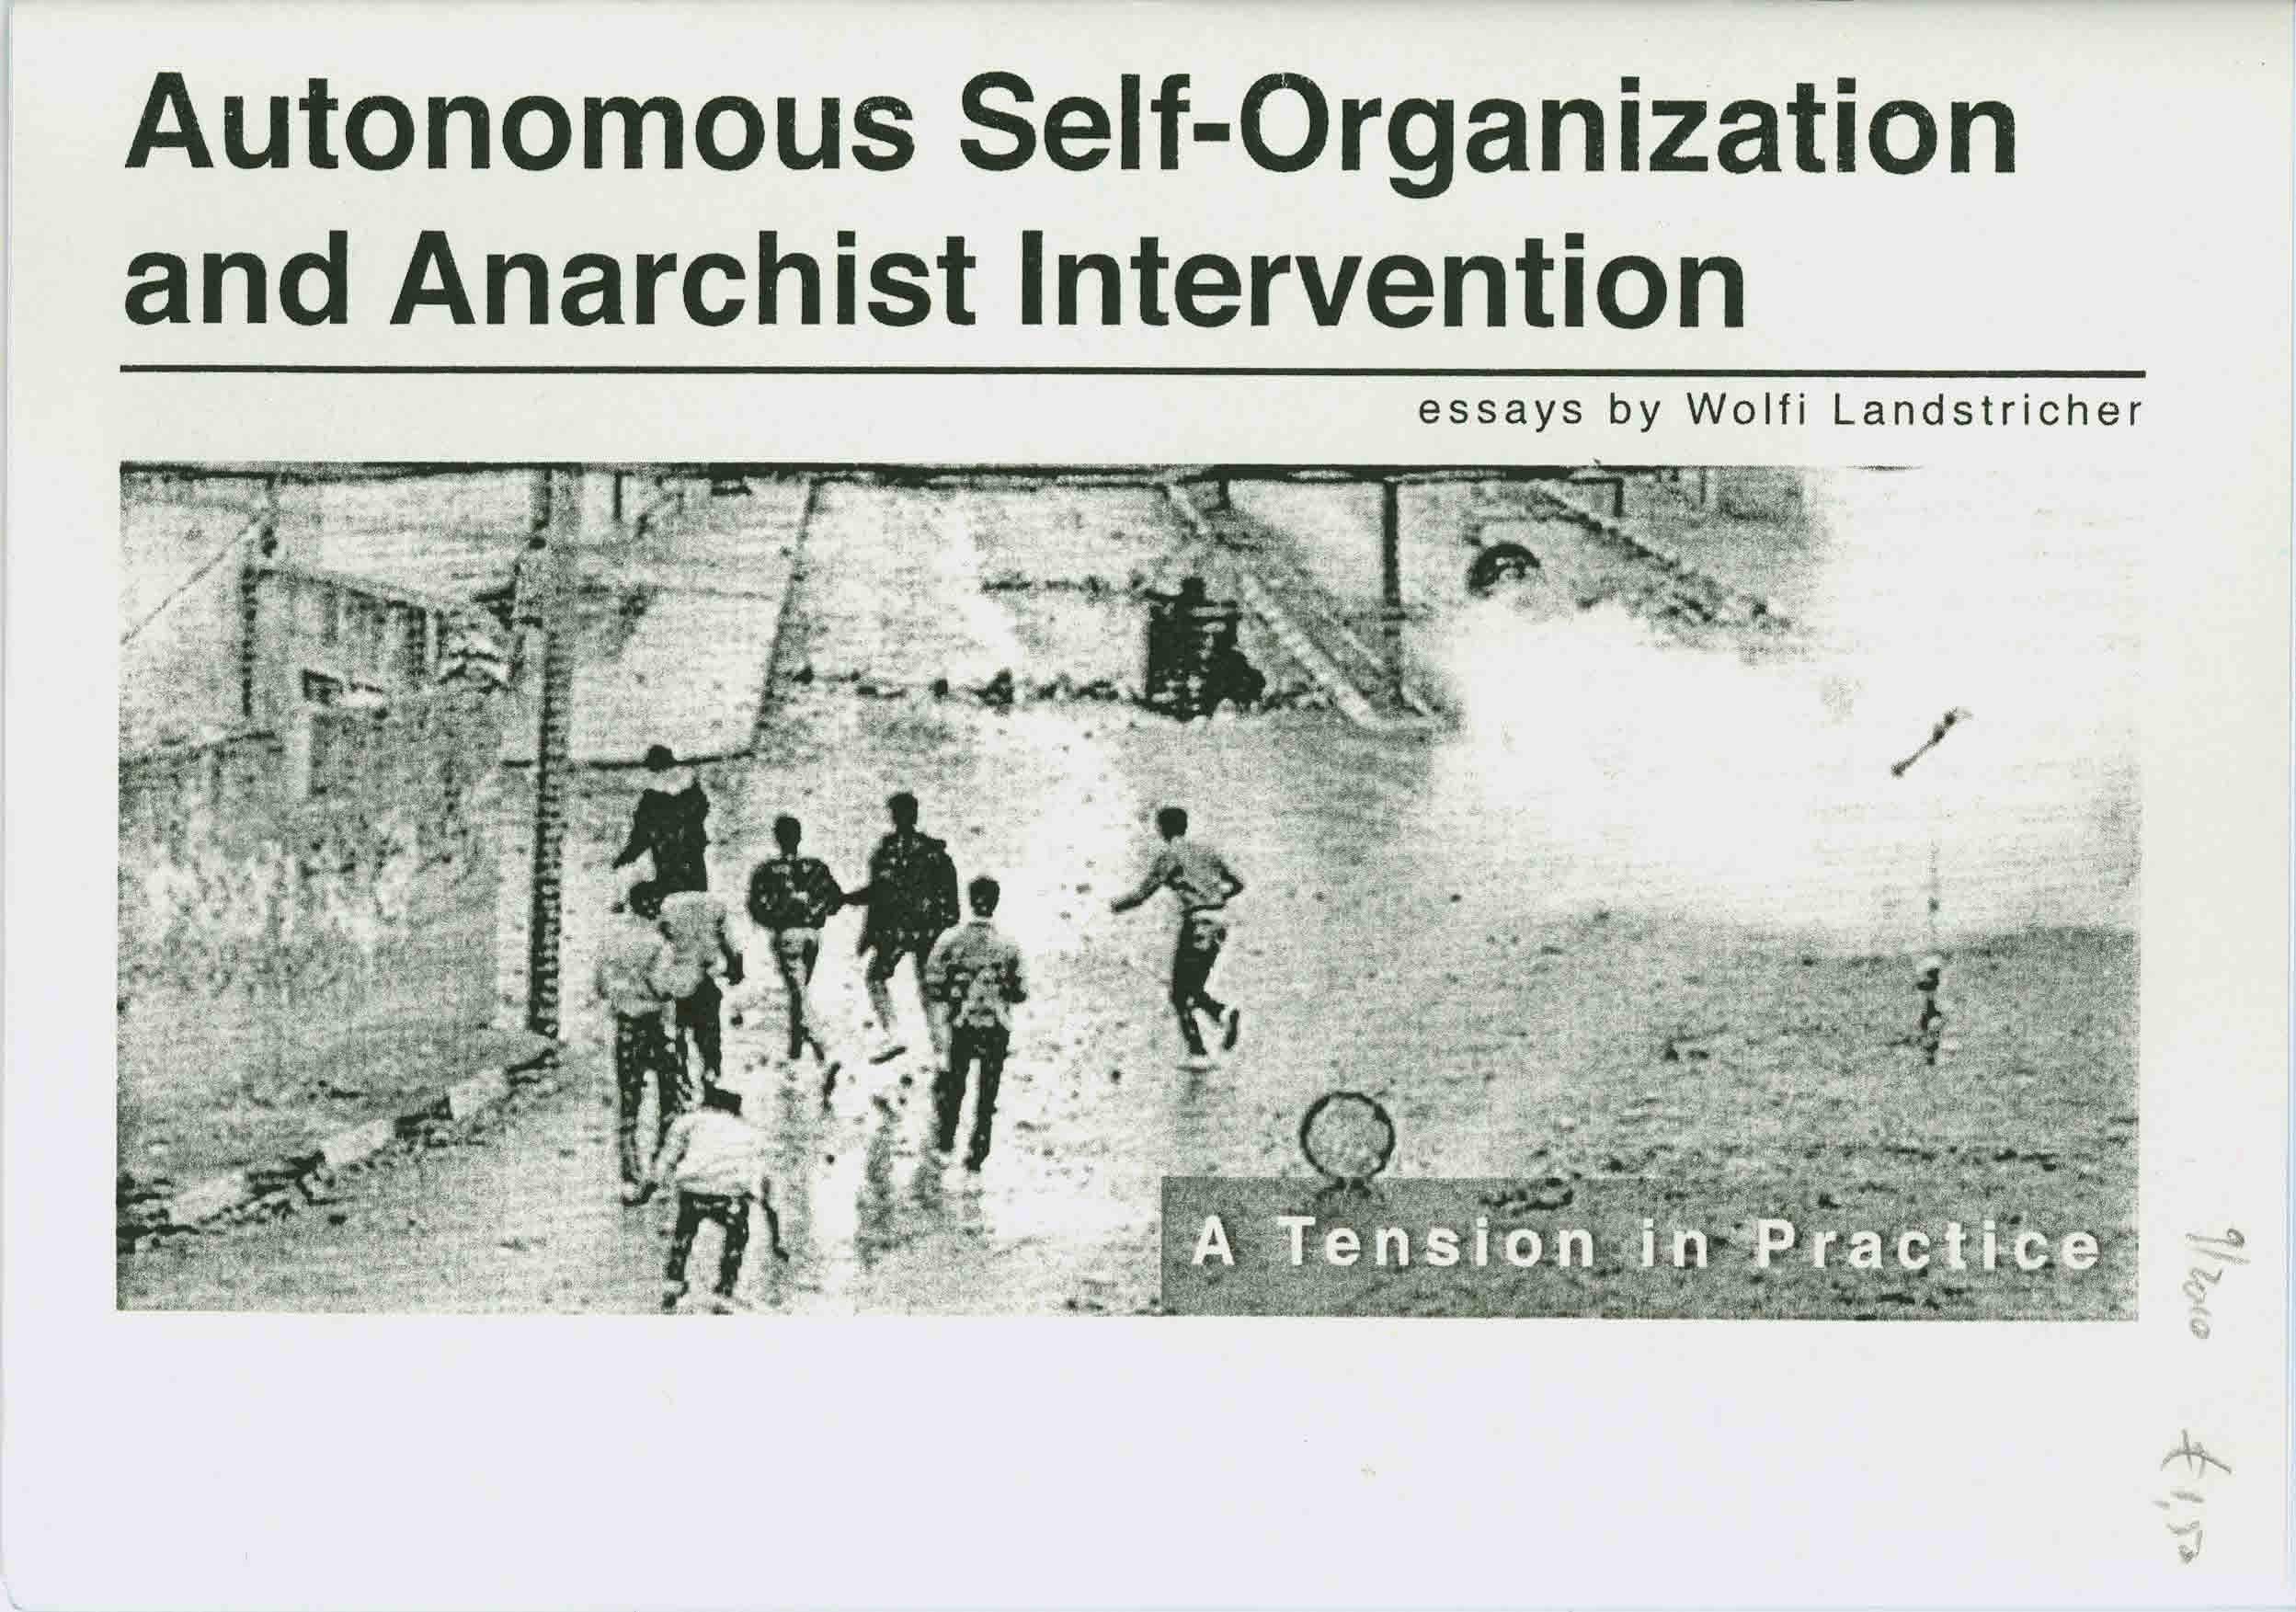 Autonomous Sef-Organization and Anarchist Intervention